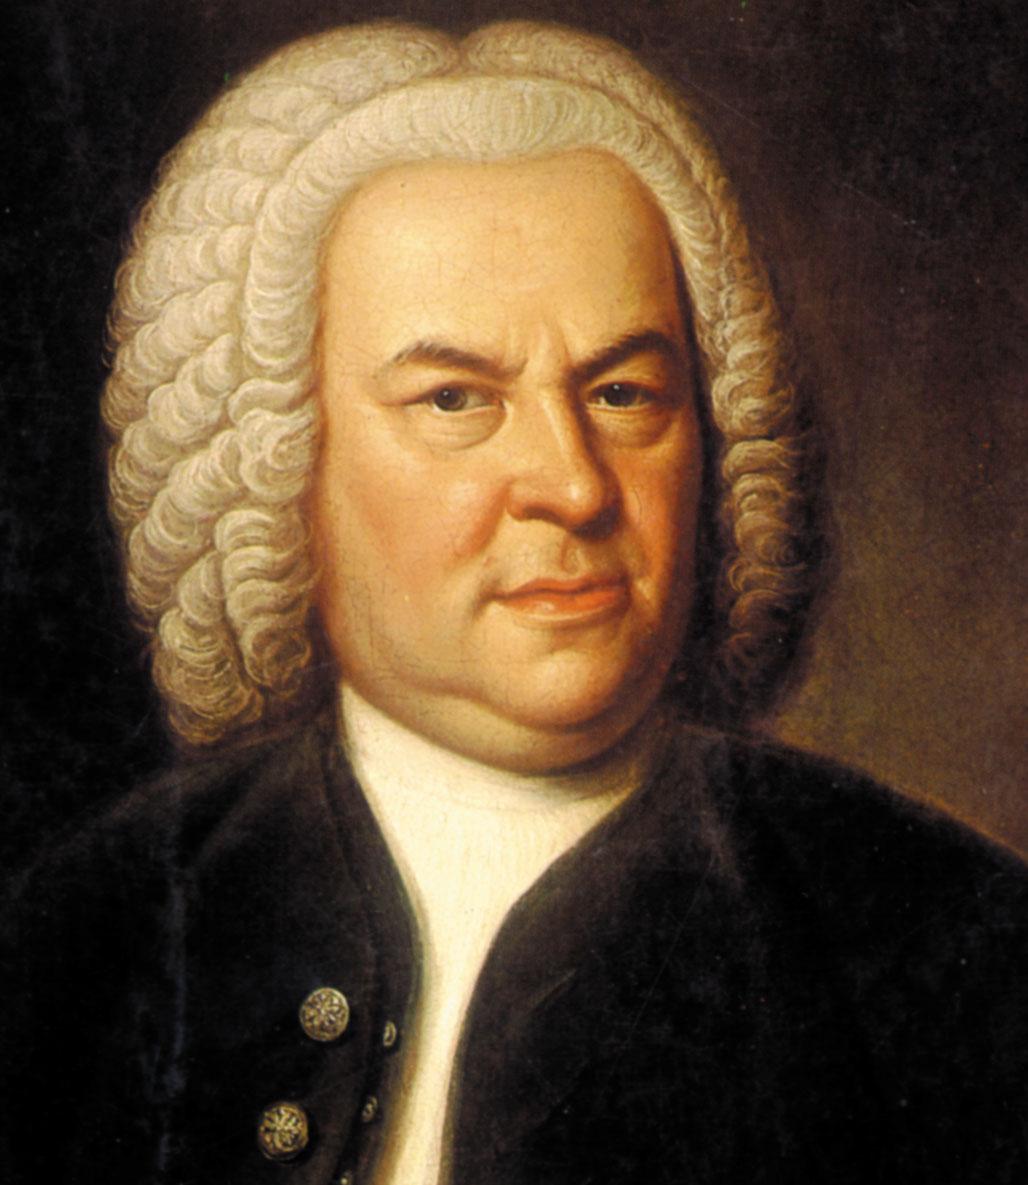 A biography of johann sebastian bach a great composer